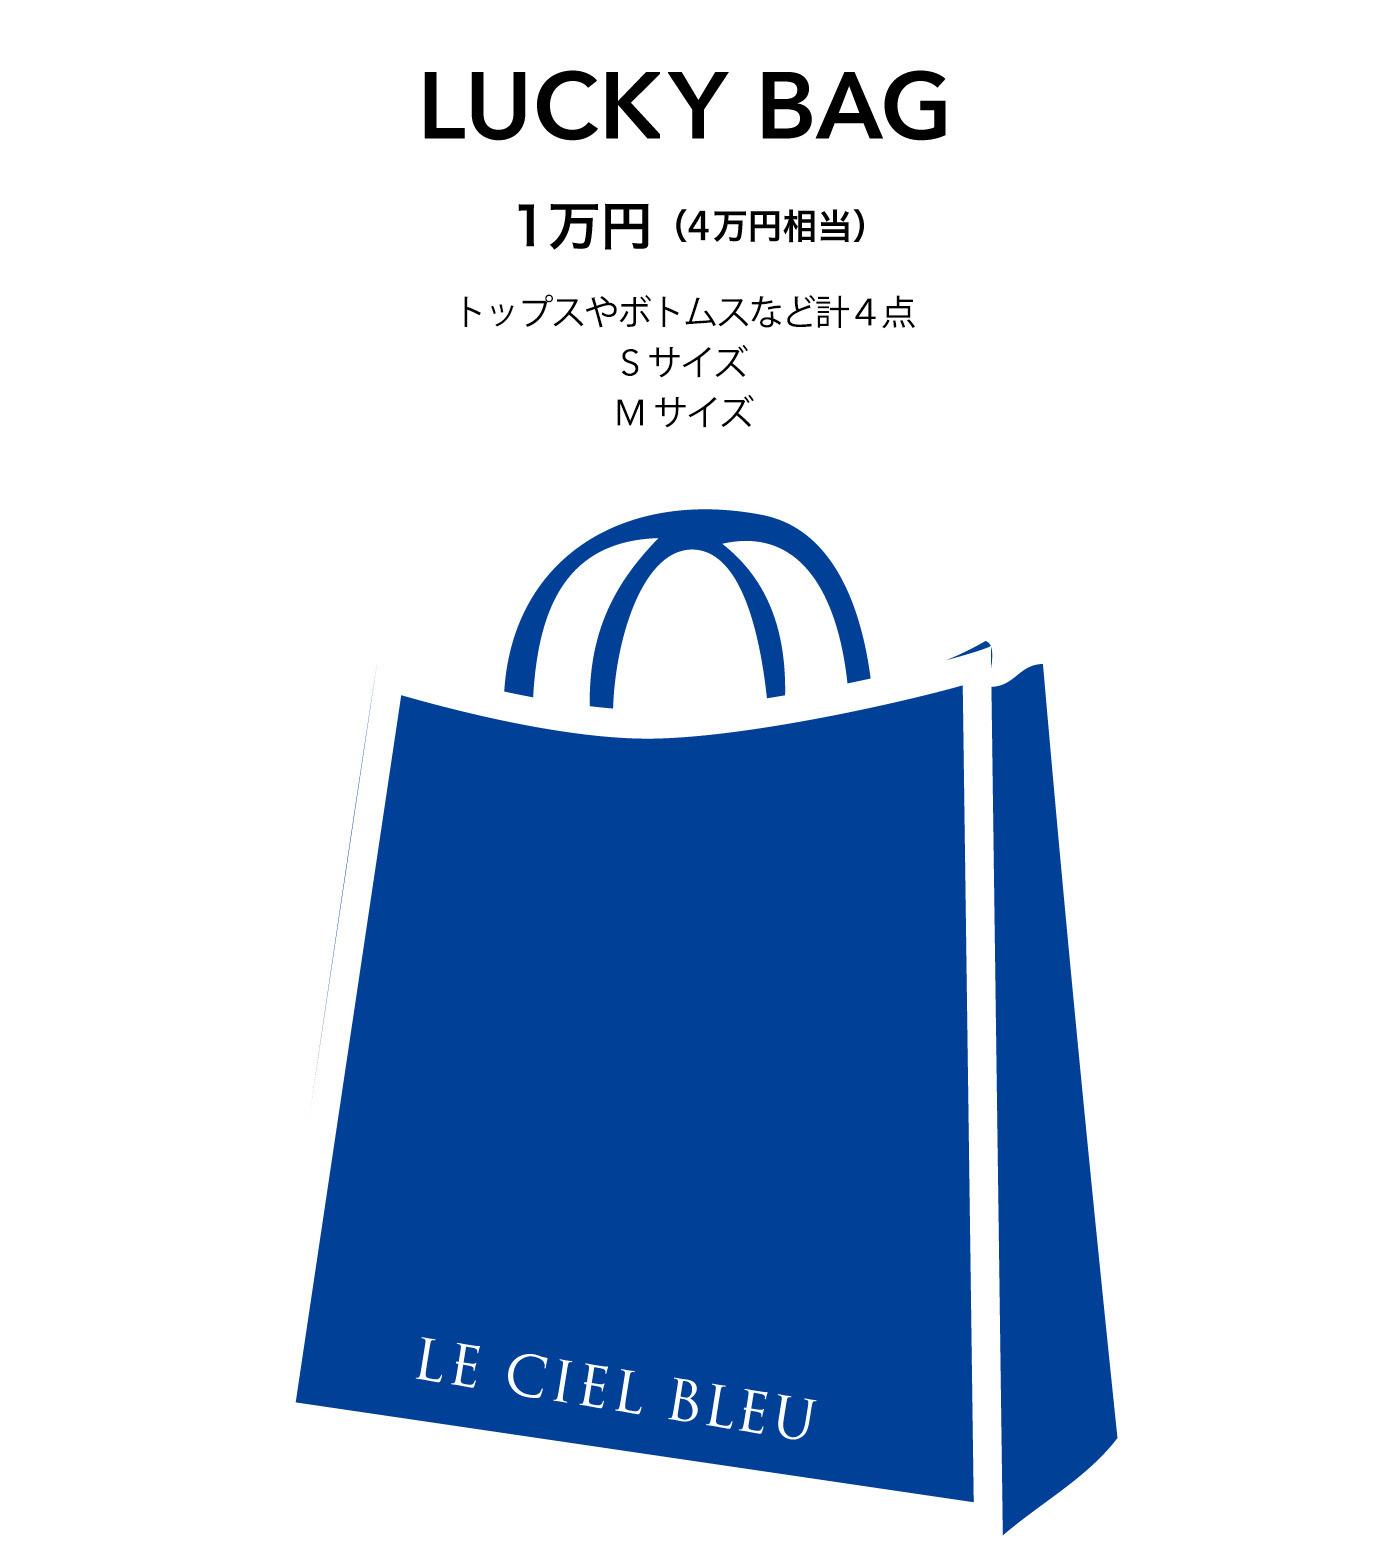 LE CIEL BLEU(ルシェルブルー)のLCB福袋Sサイズ1万円(2017年)-NONE(アザーズ/others)-F-2017LCB-S1 拡大詳細画像1